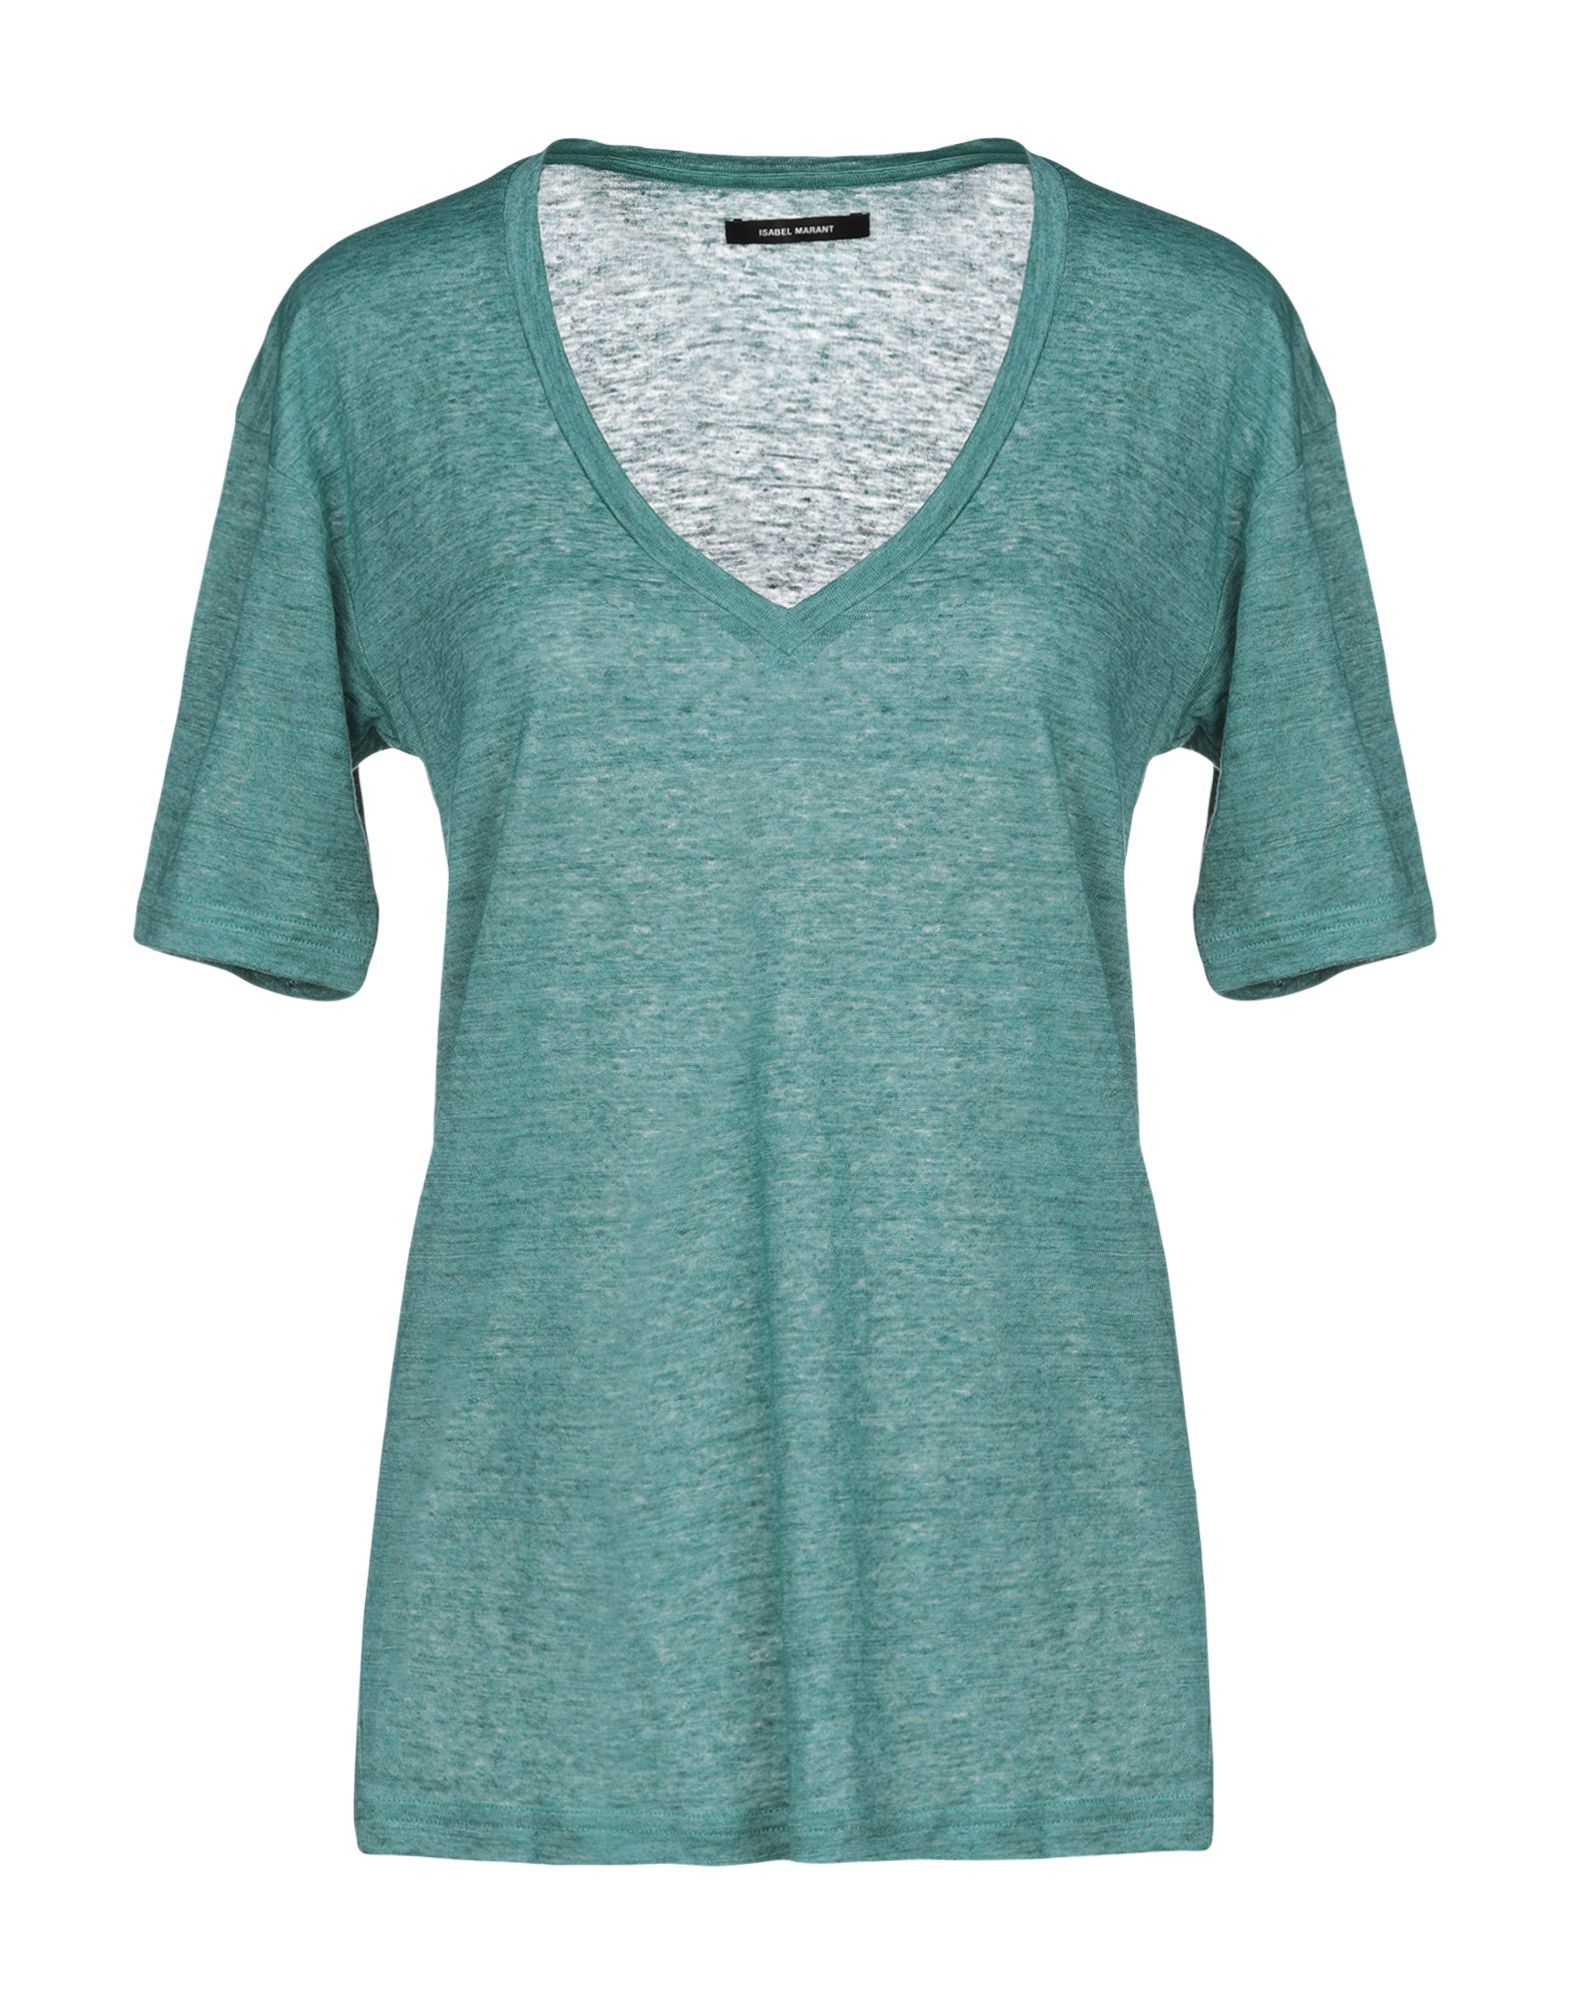 Isabel Marant Green Linen V-Neck T-Shirt